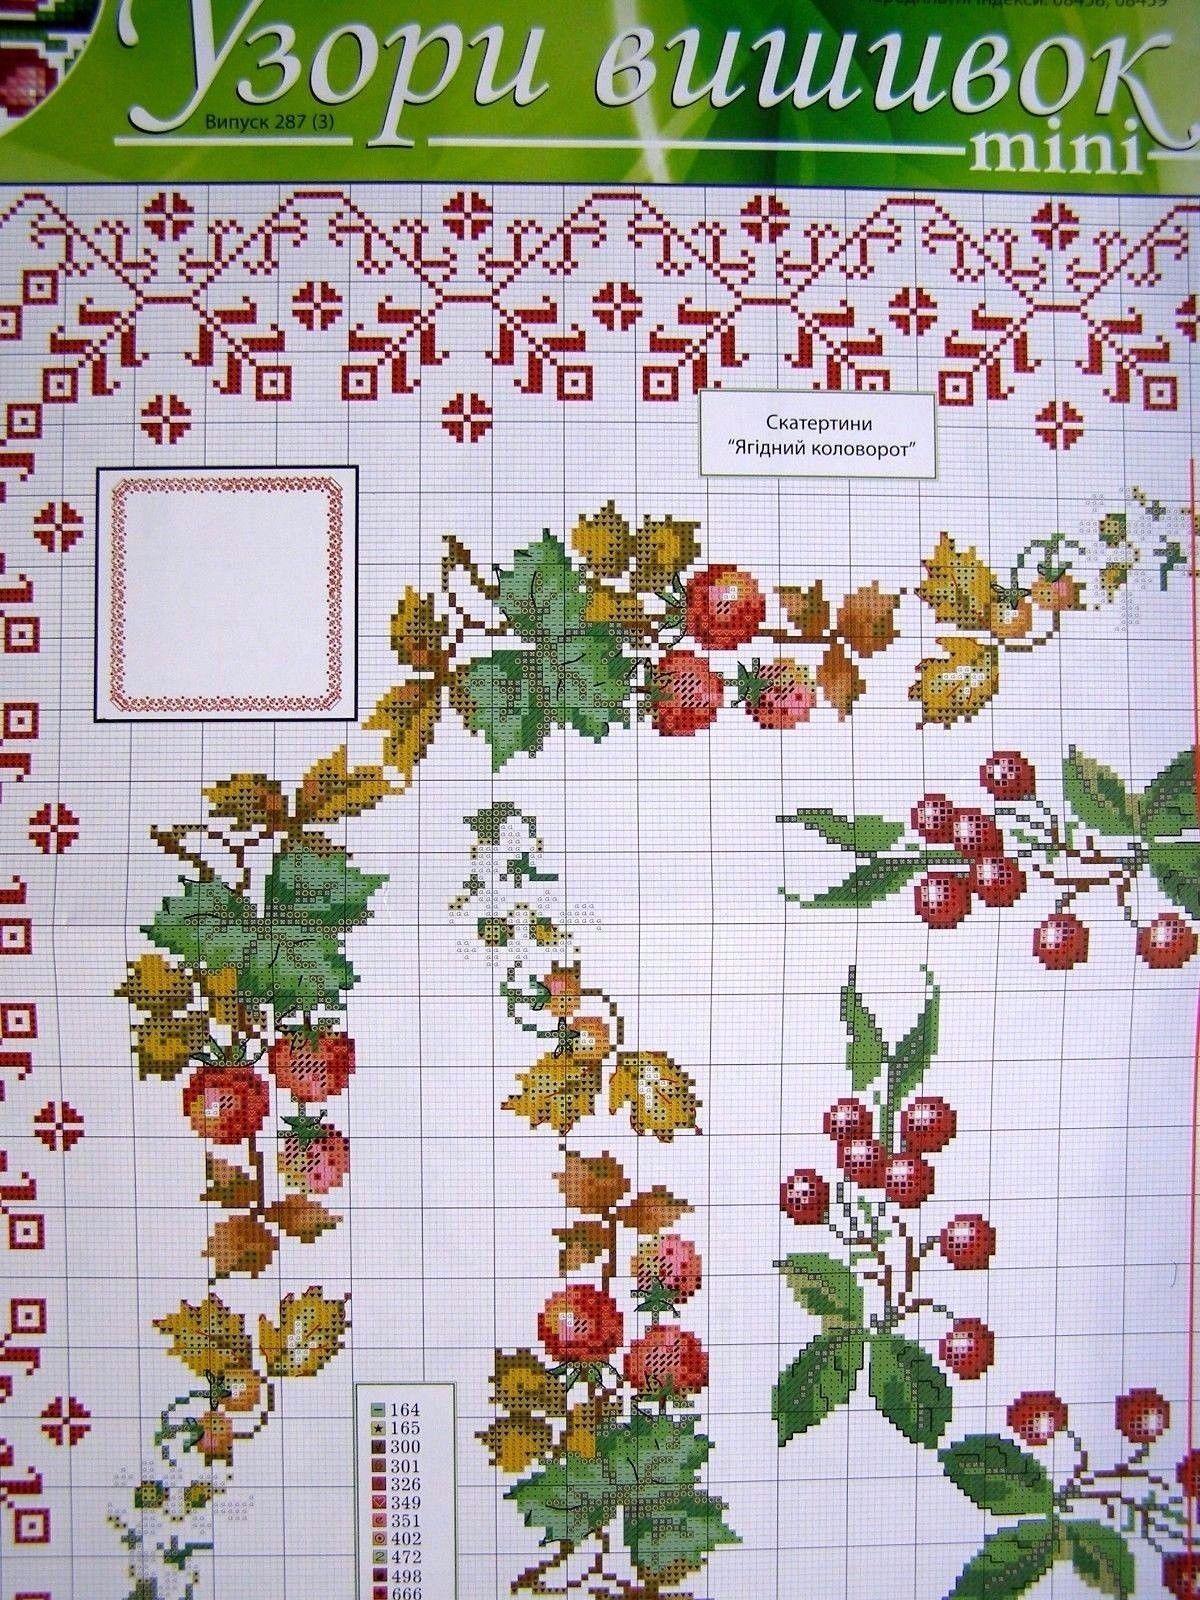 Uz 10 Cross Stitch Ukrainian Embroidery Pattern Tablecloth Napkin Vyshyvanka Embroidery Patterns Cross Stitch Cross Stitch Designs